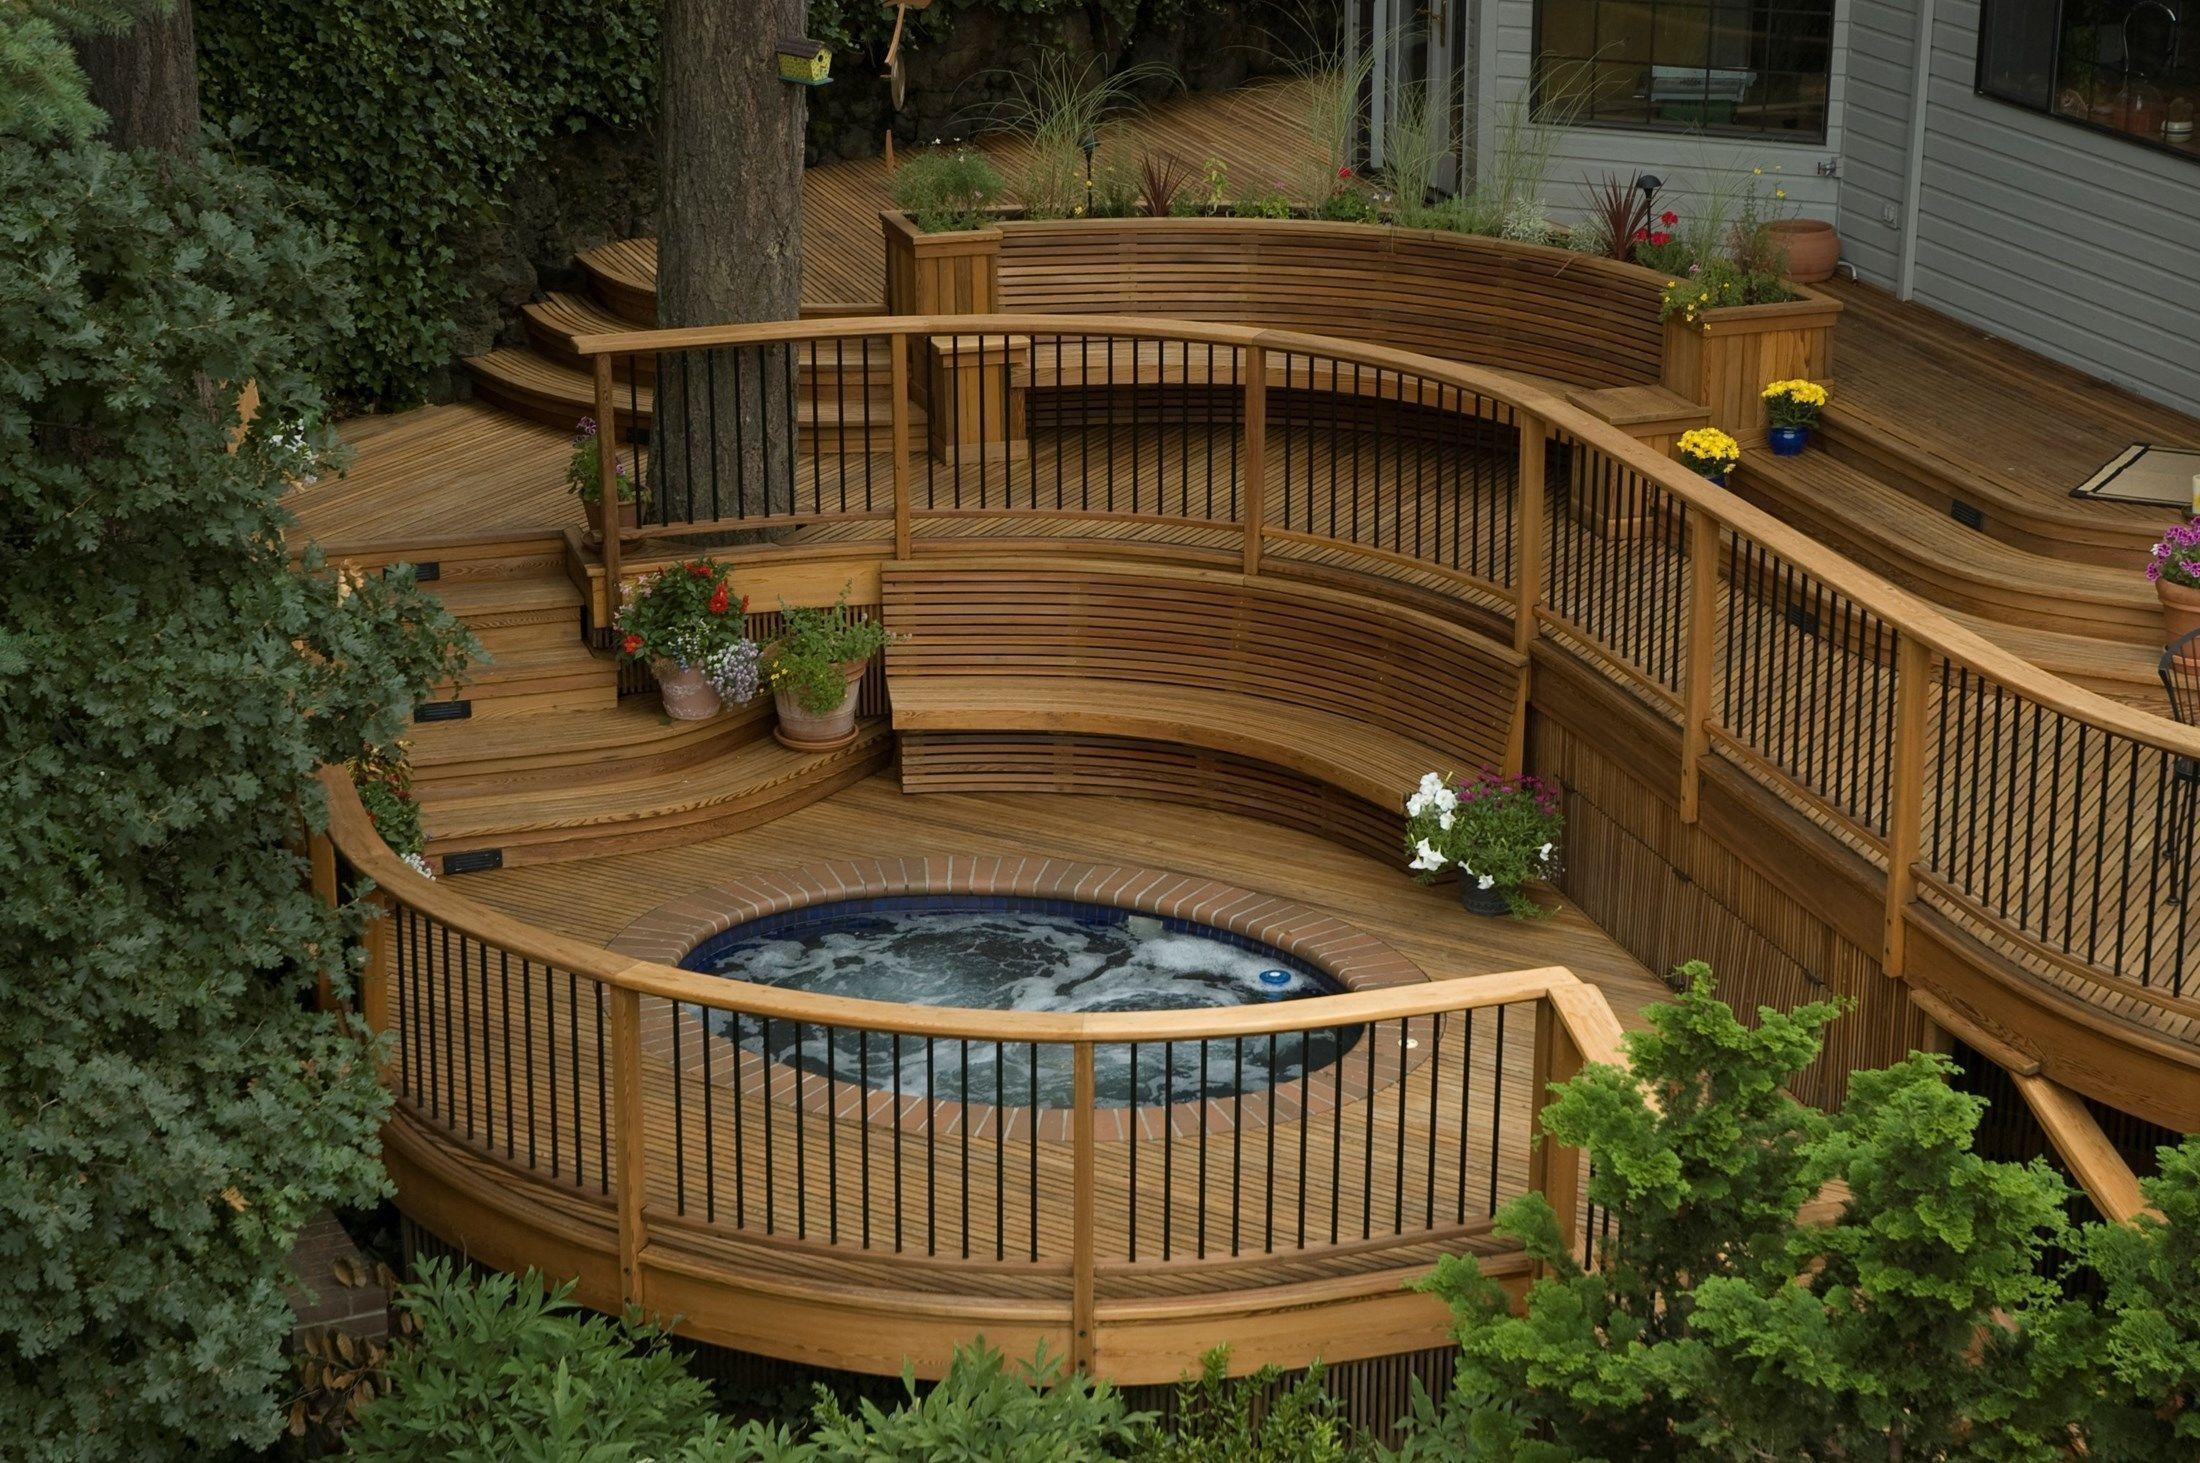 23 Gorgeous Small Wooden Deck Ideas For Small Backyards With Images Deck Designs Backyard Decks Backyard Building A Deck